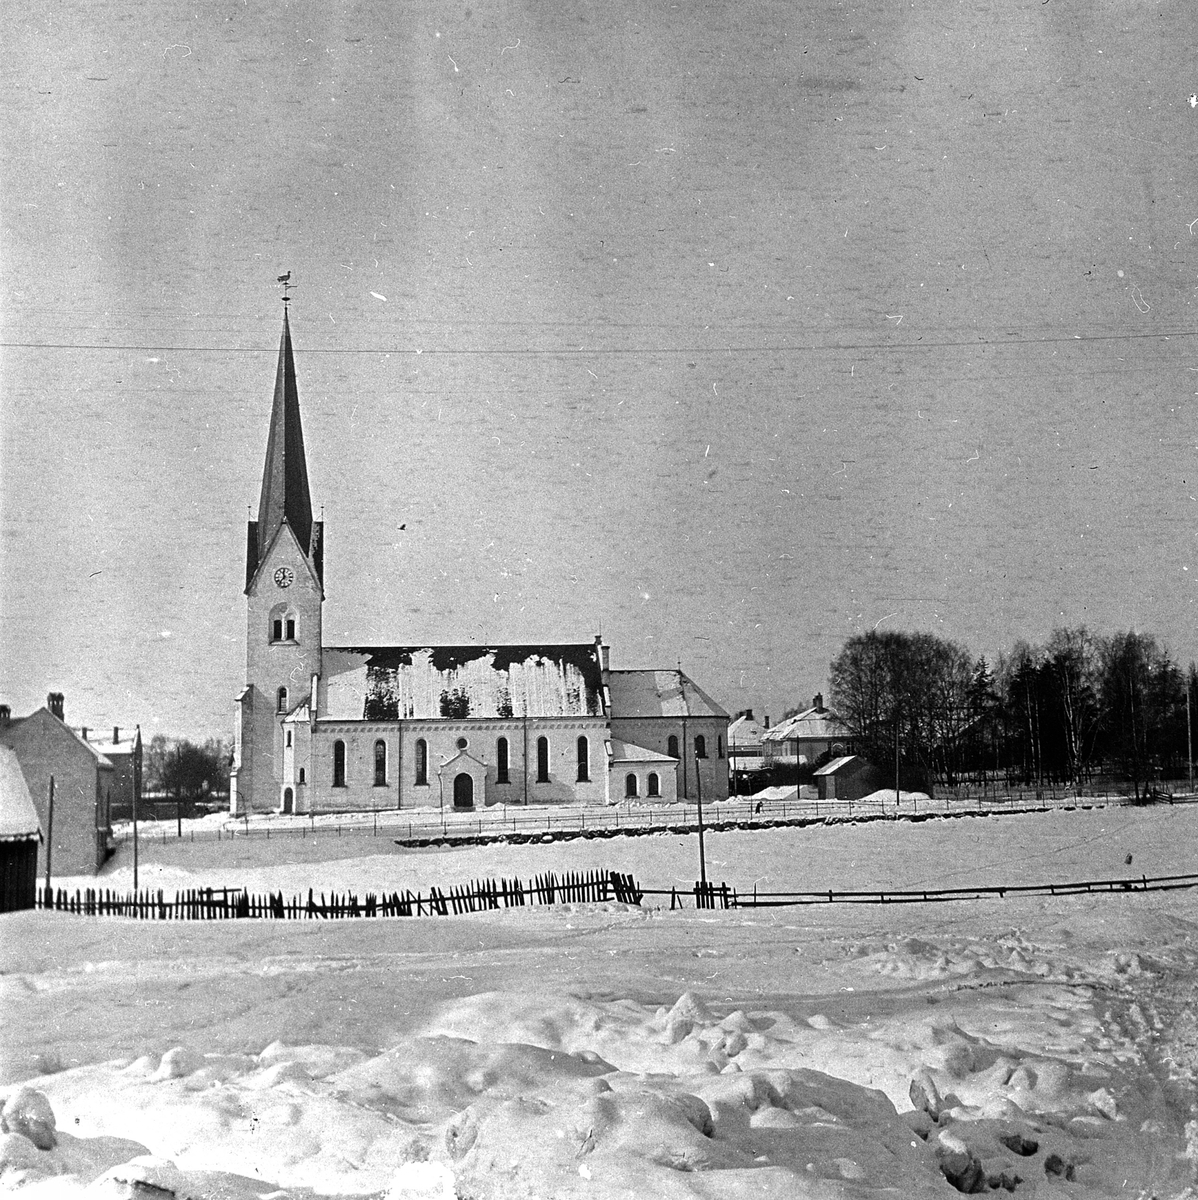 HAMAR DOMKIRKE, VINTER, HOLSETGATA. 1920-1925